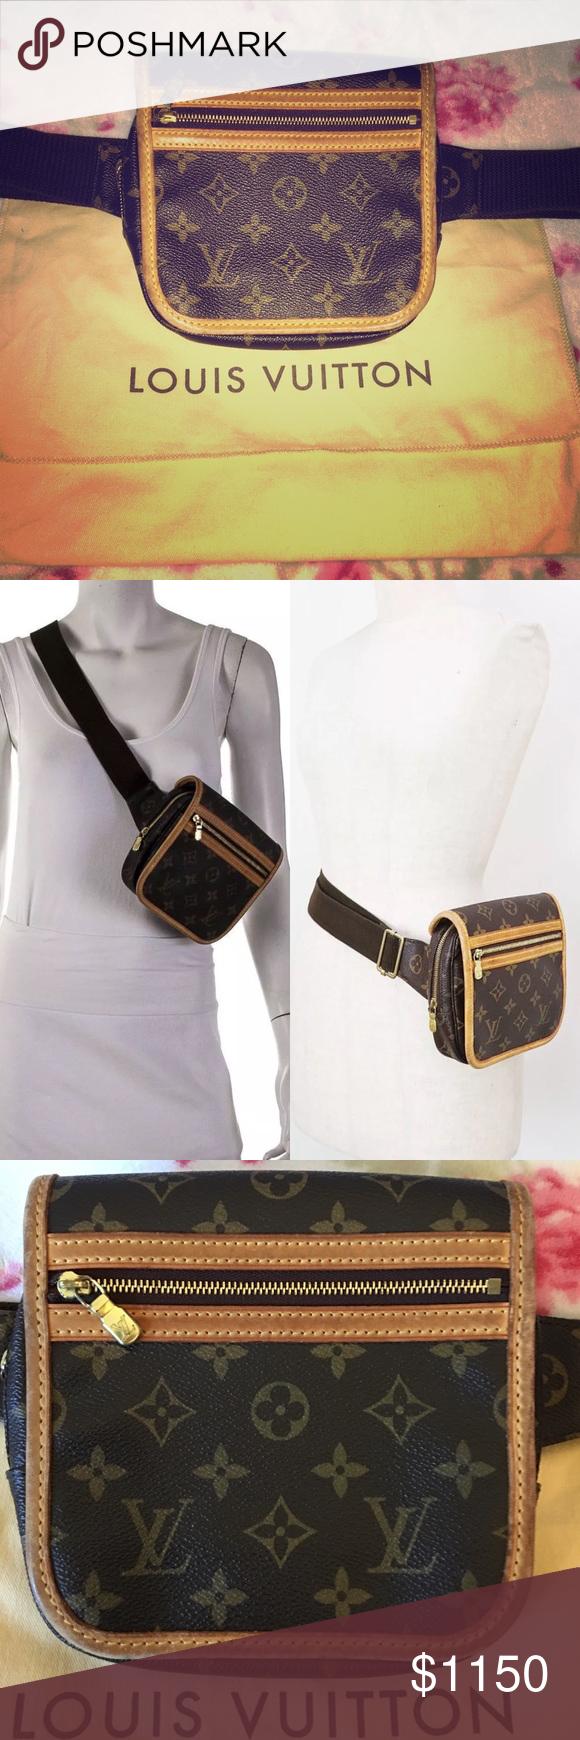 dcfb122d978d Louis Vuitton Fanny Pack   Crossbody   Belt Bag Louis Vuitton Bosphore  Fanny Pack  Bum